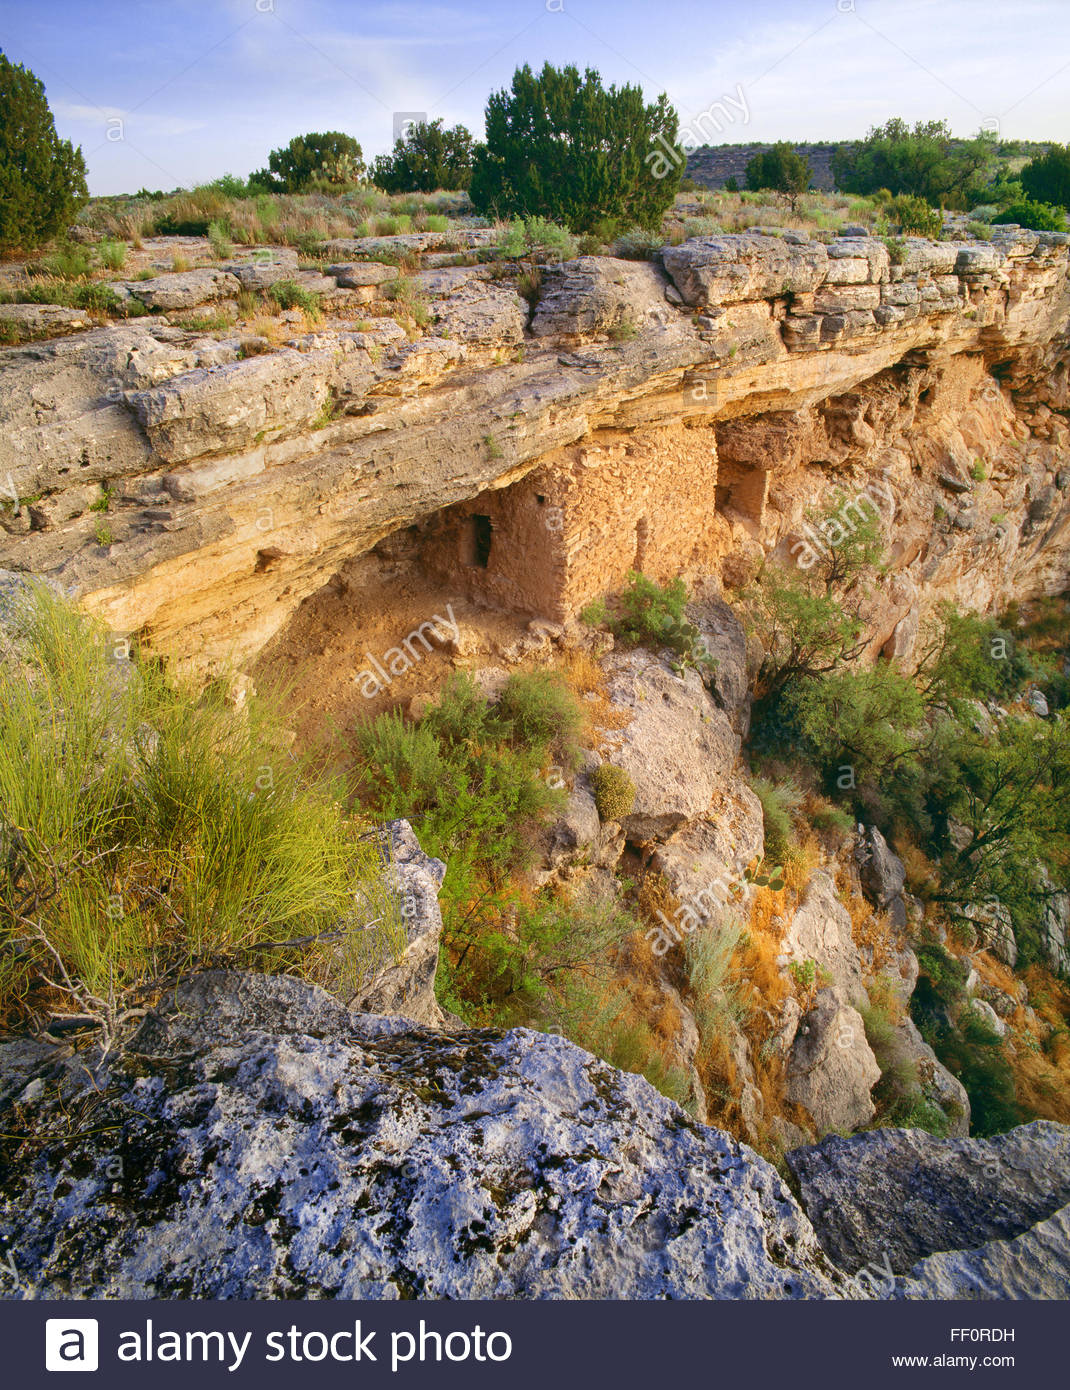 Sinagua culture cliff dwelling below the rim of 'Montezuma Well'  [Montezuma Castle National Monument] Arizona - Stock Image